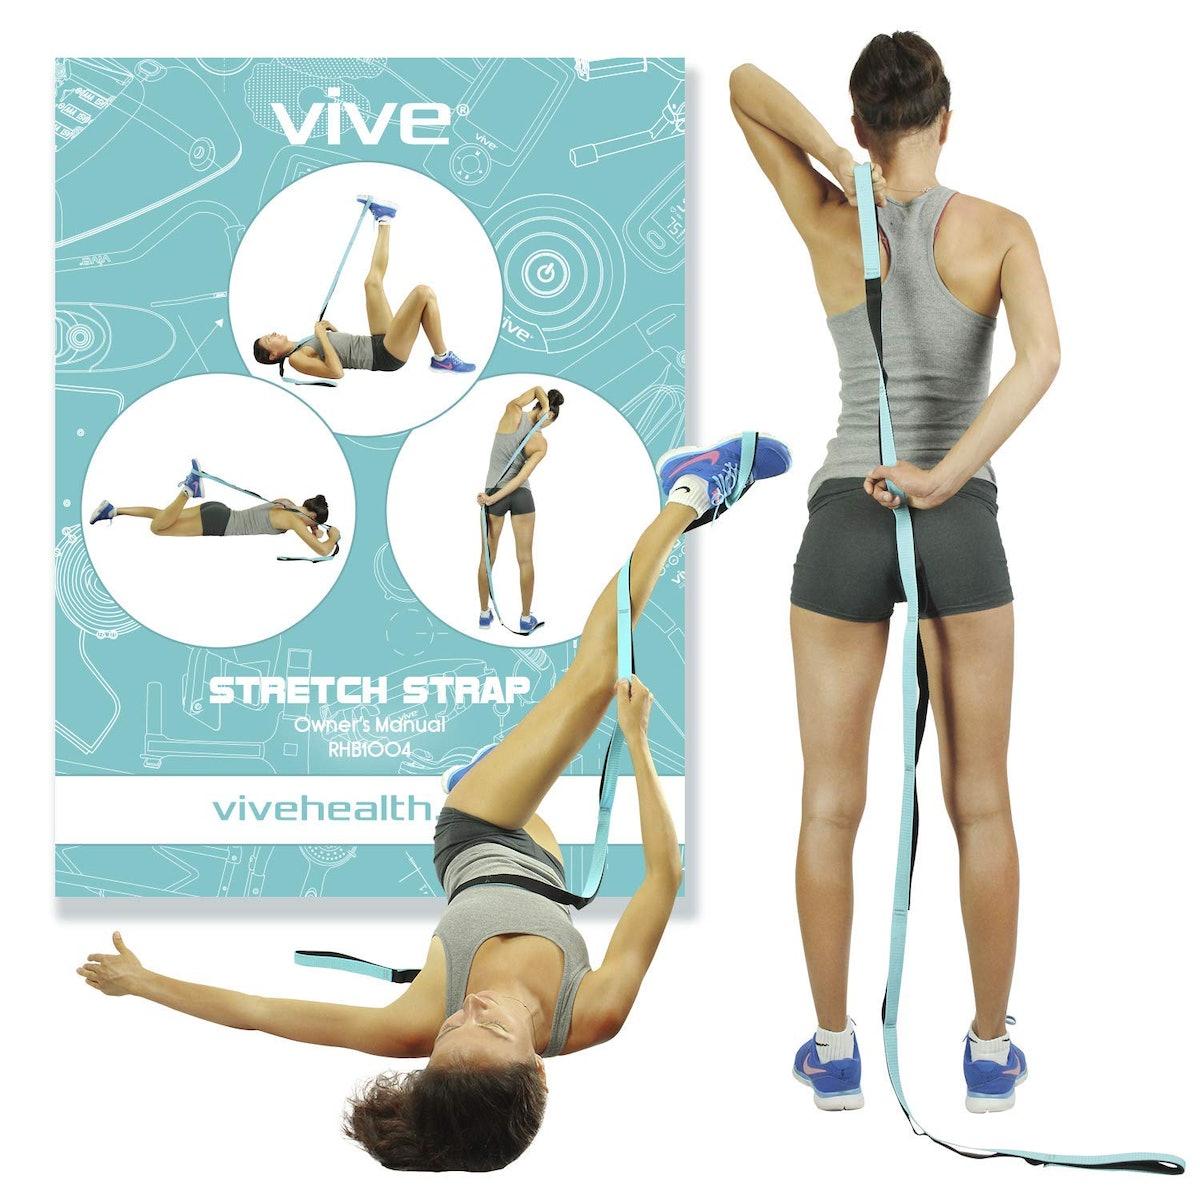 Vive Stretch Strap